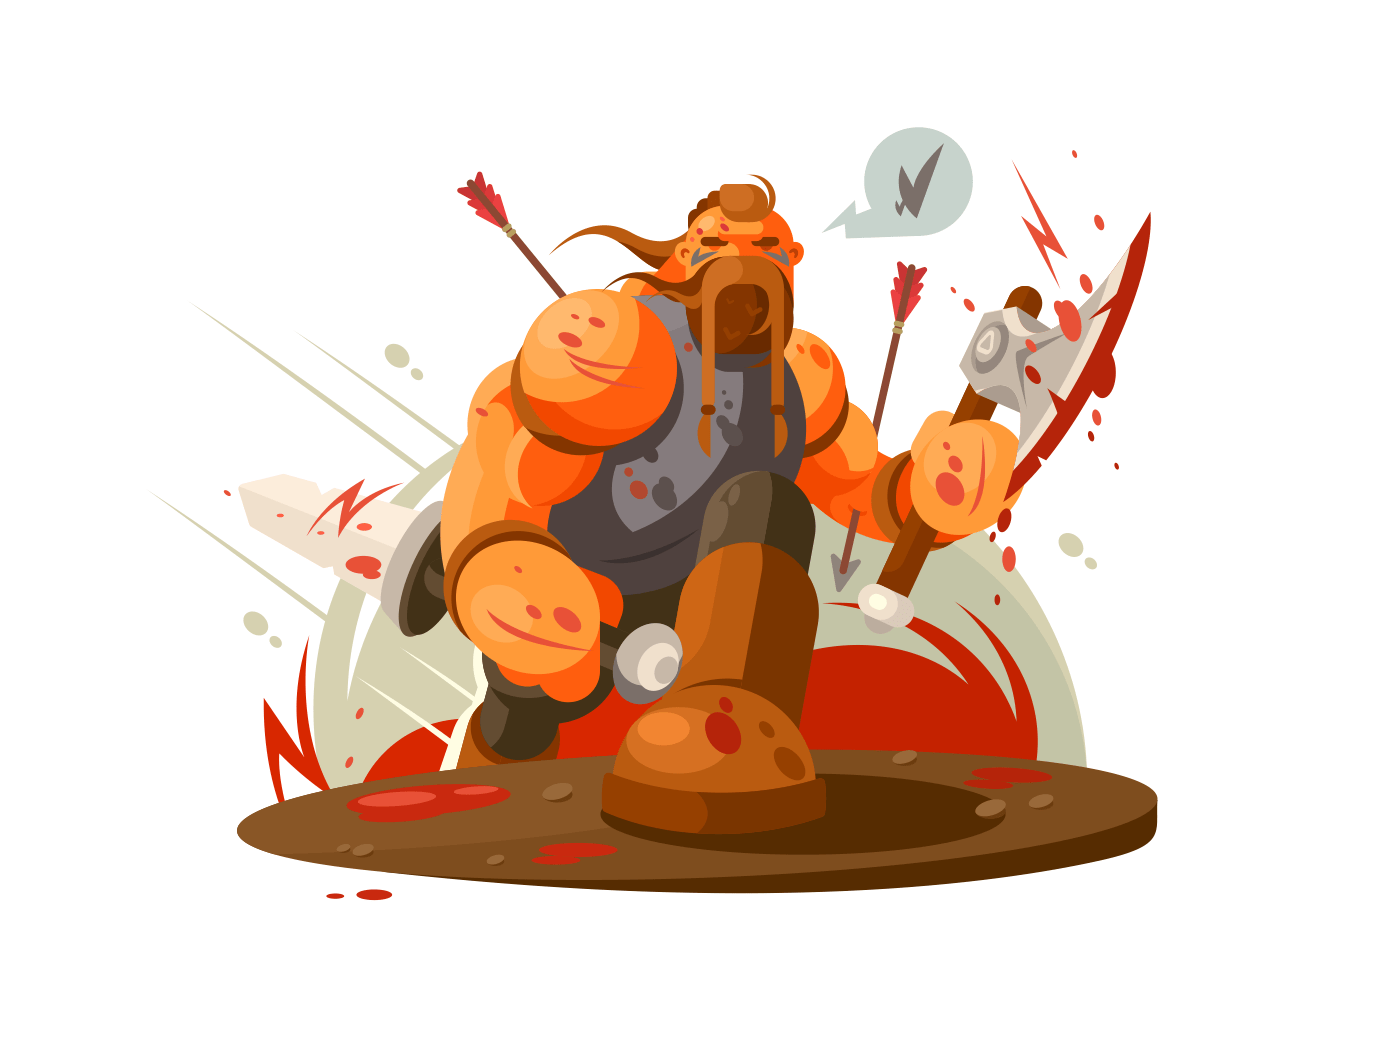 Viking battle with ax illustration